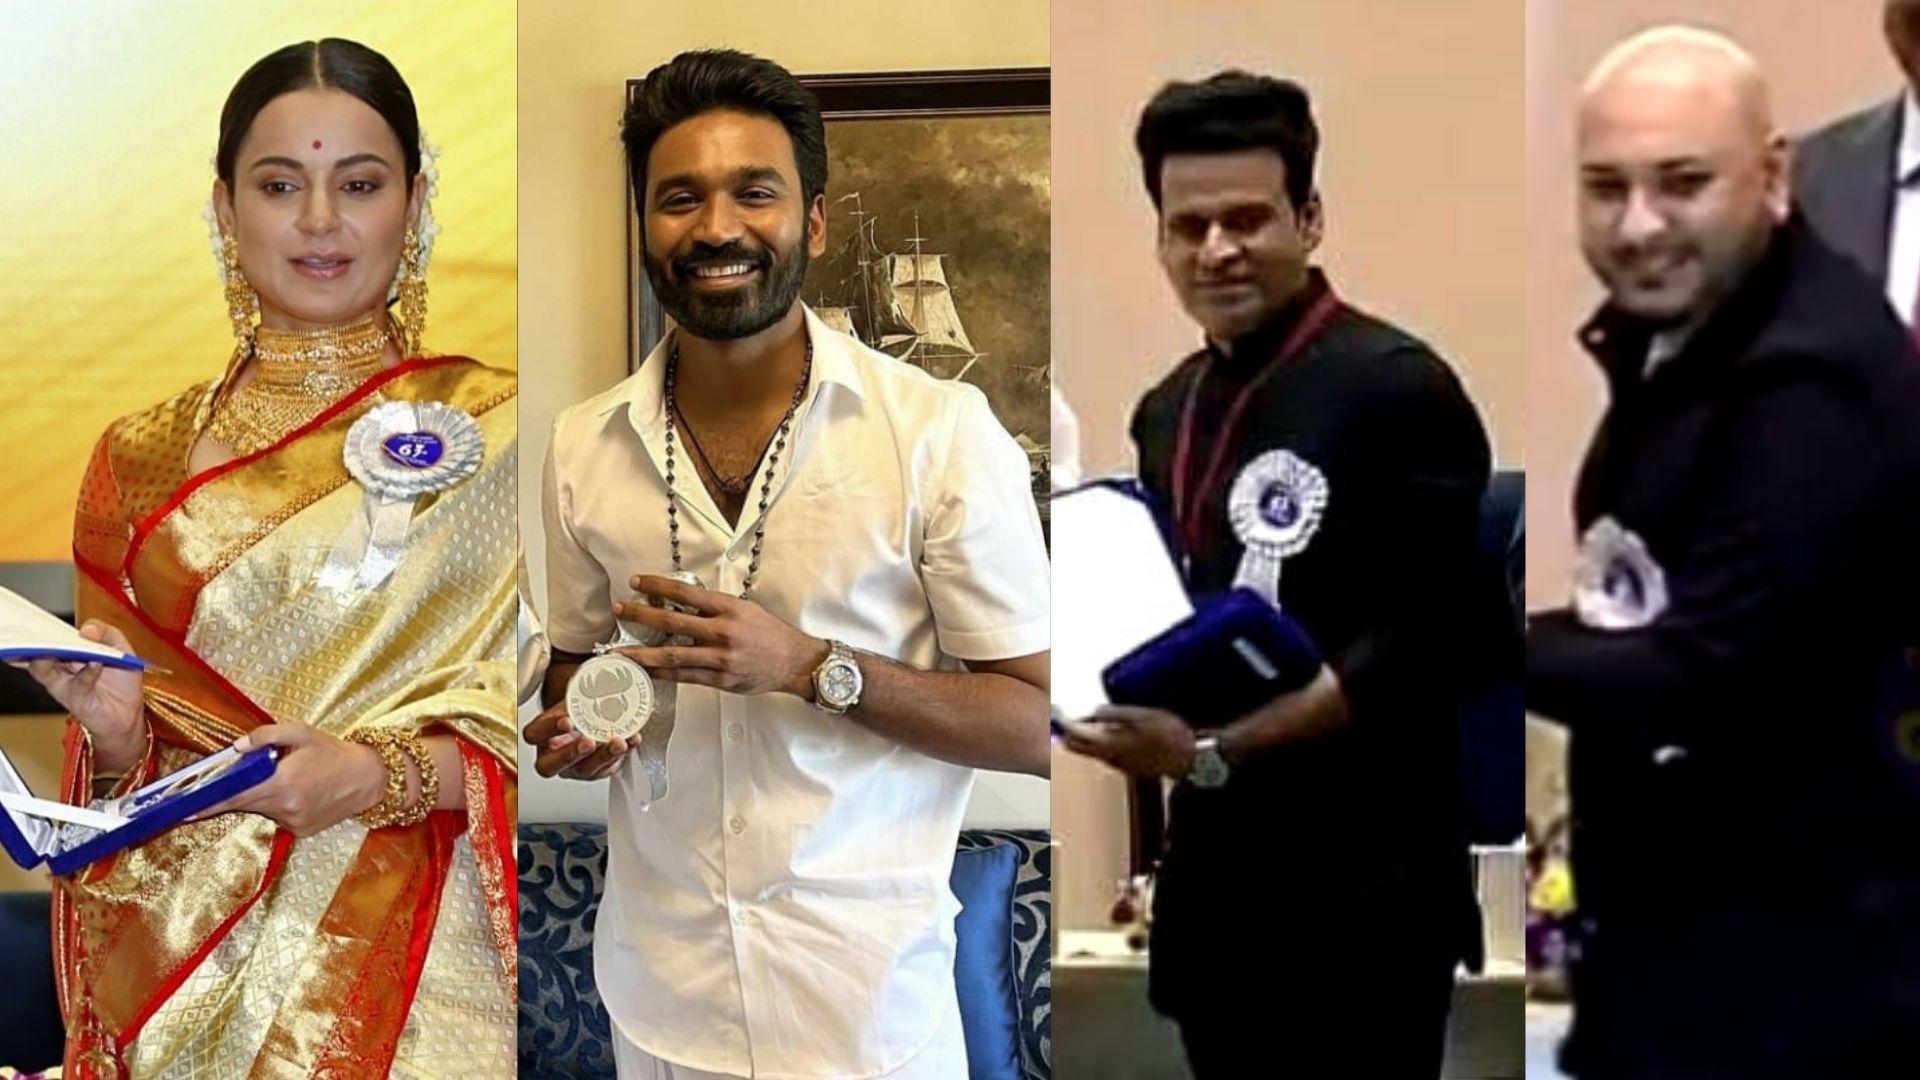 67th National Film Awards Winners List: Kangana Ranaut, Manoj Bajpayee, Dhanush, B Praak And Others Take The Prestigious Award Home